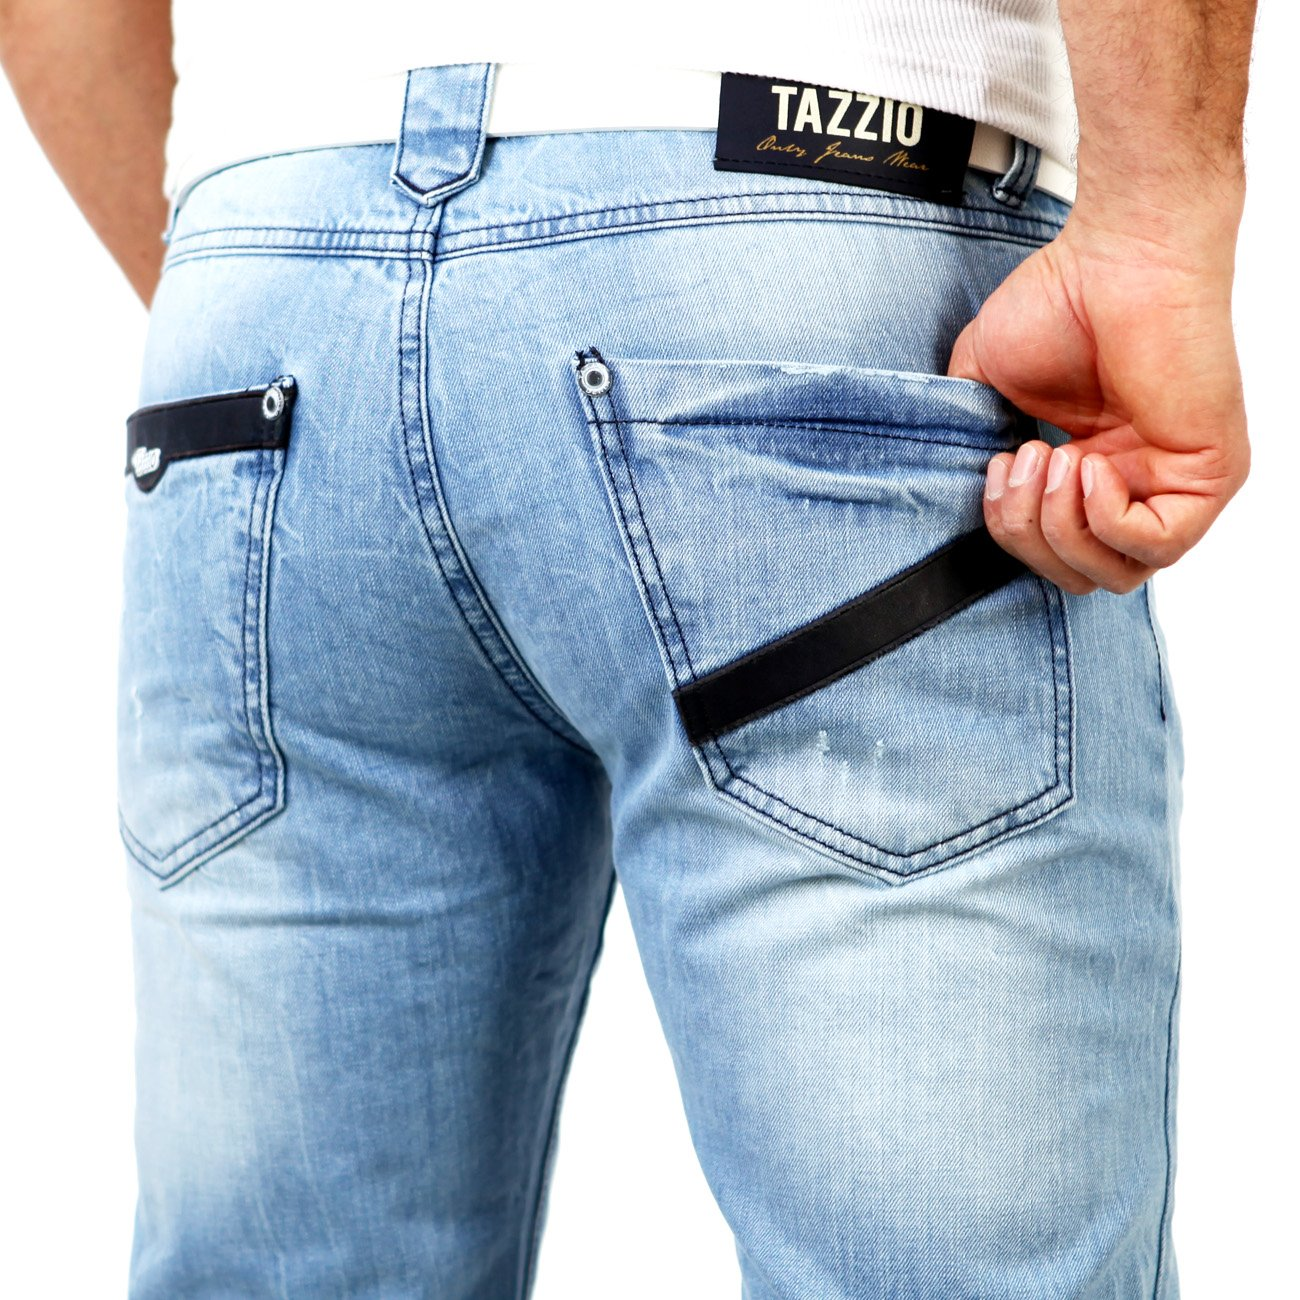 herren jeans hellblau tazzio 5155 jeans herren g nstig. Black Bedroom Furniture Sets. Home Design Ideas